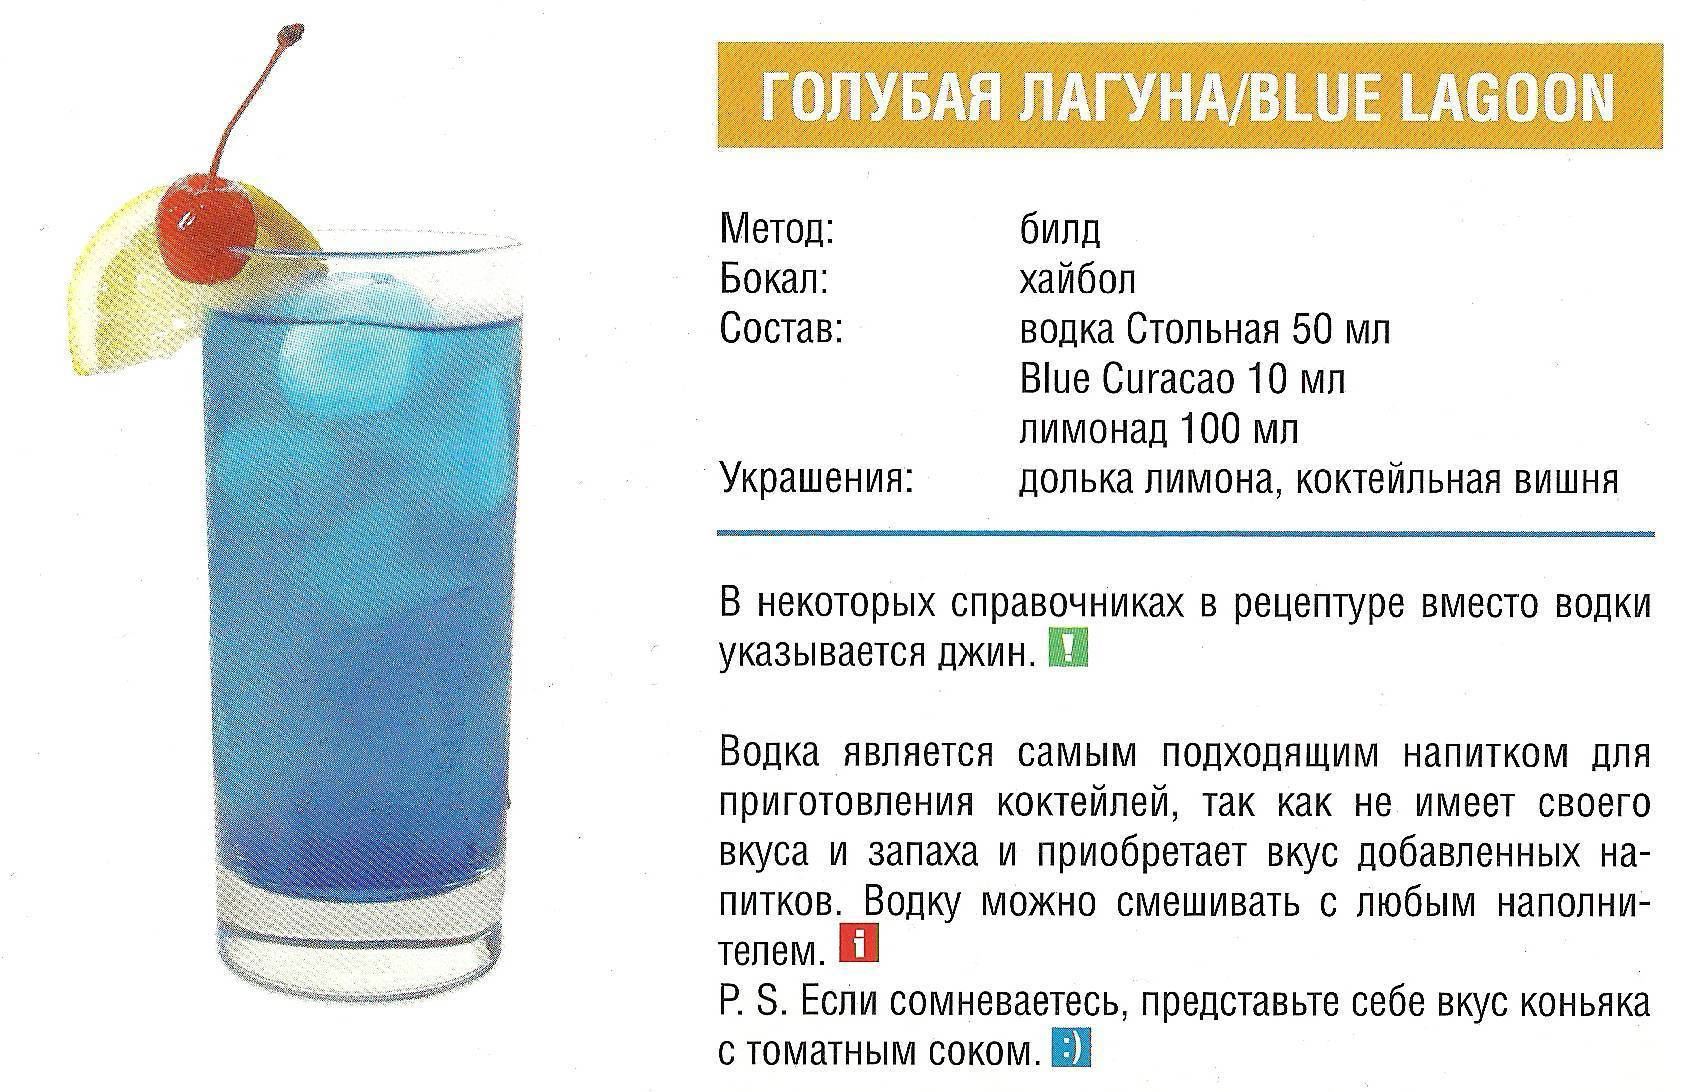 Коктейли с джином в домашних условиях